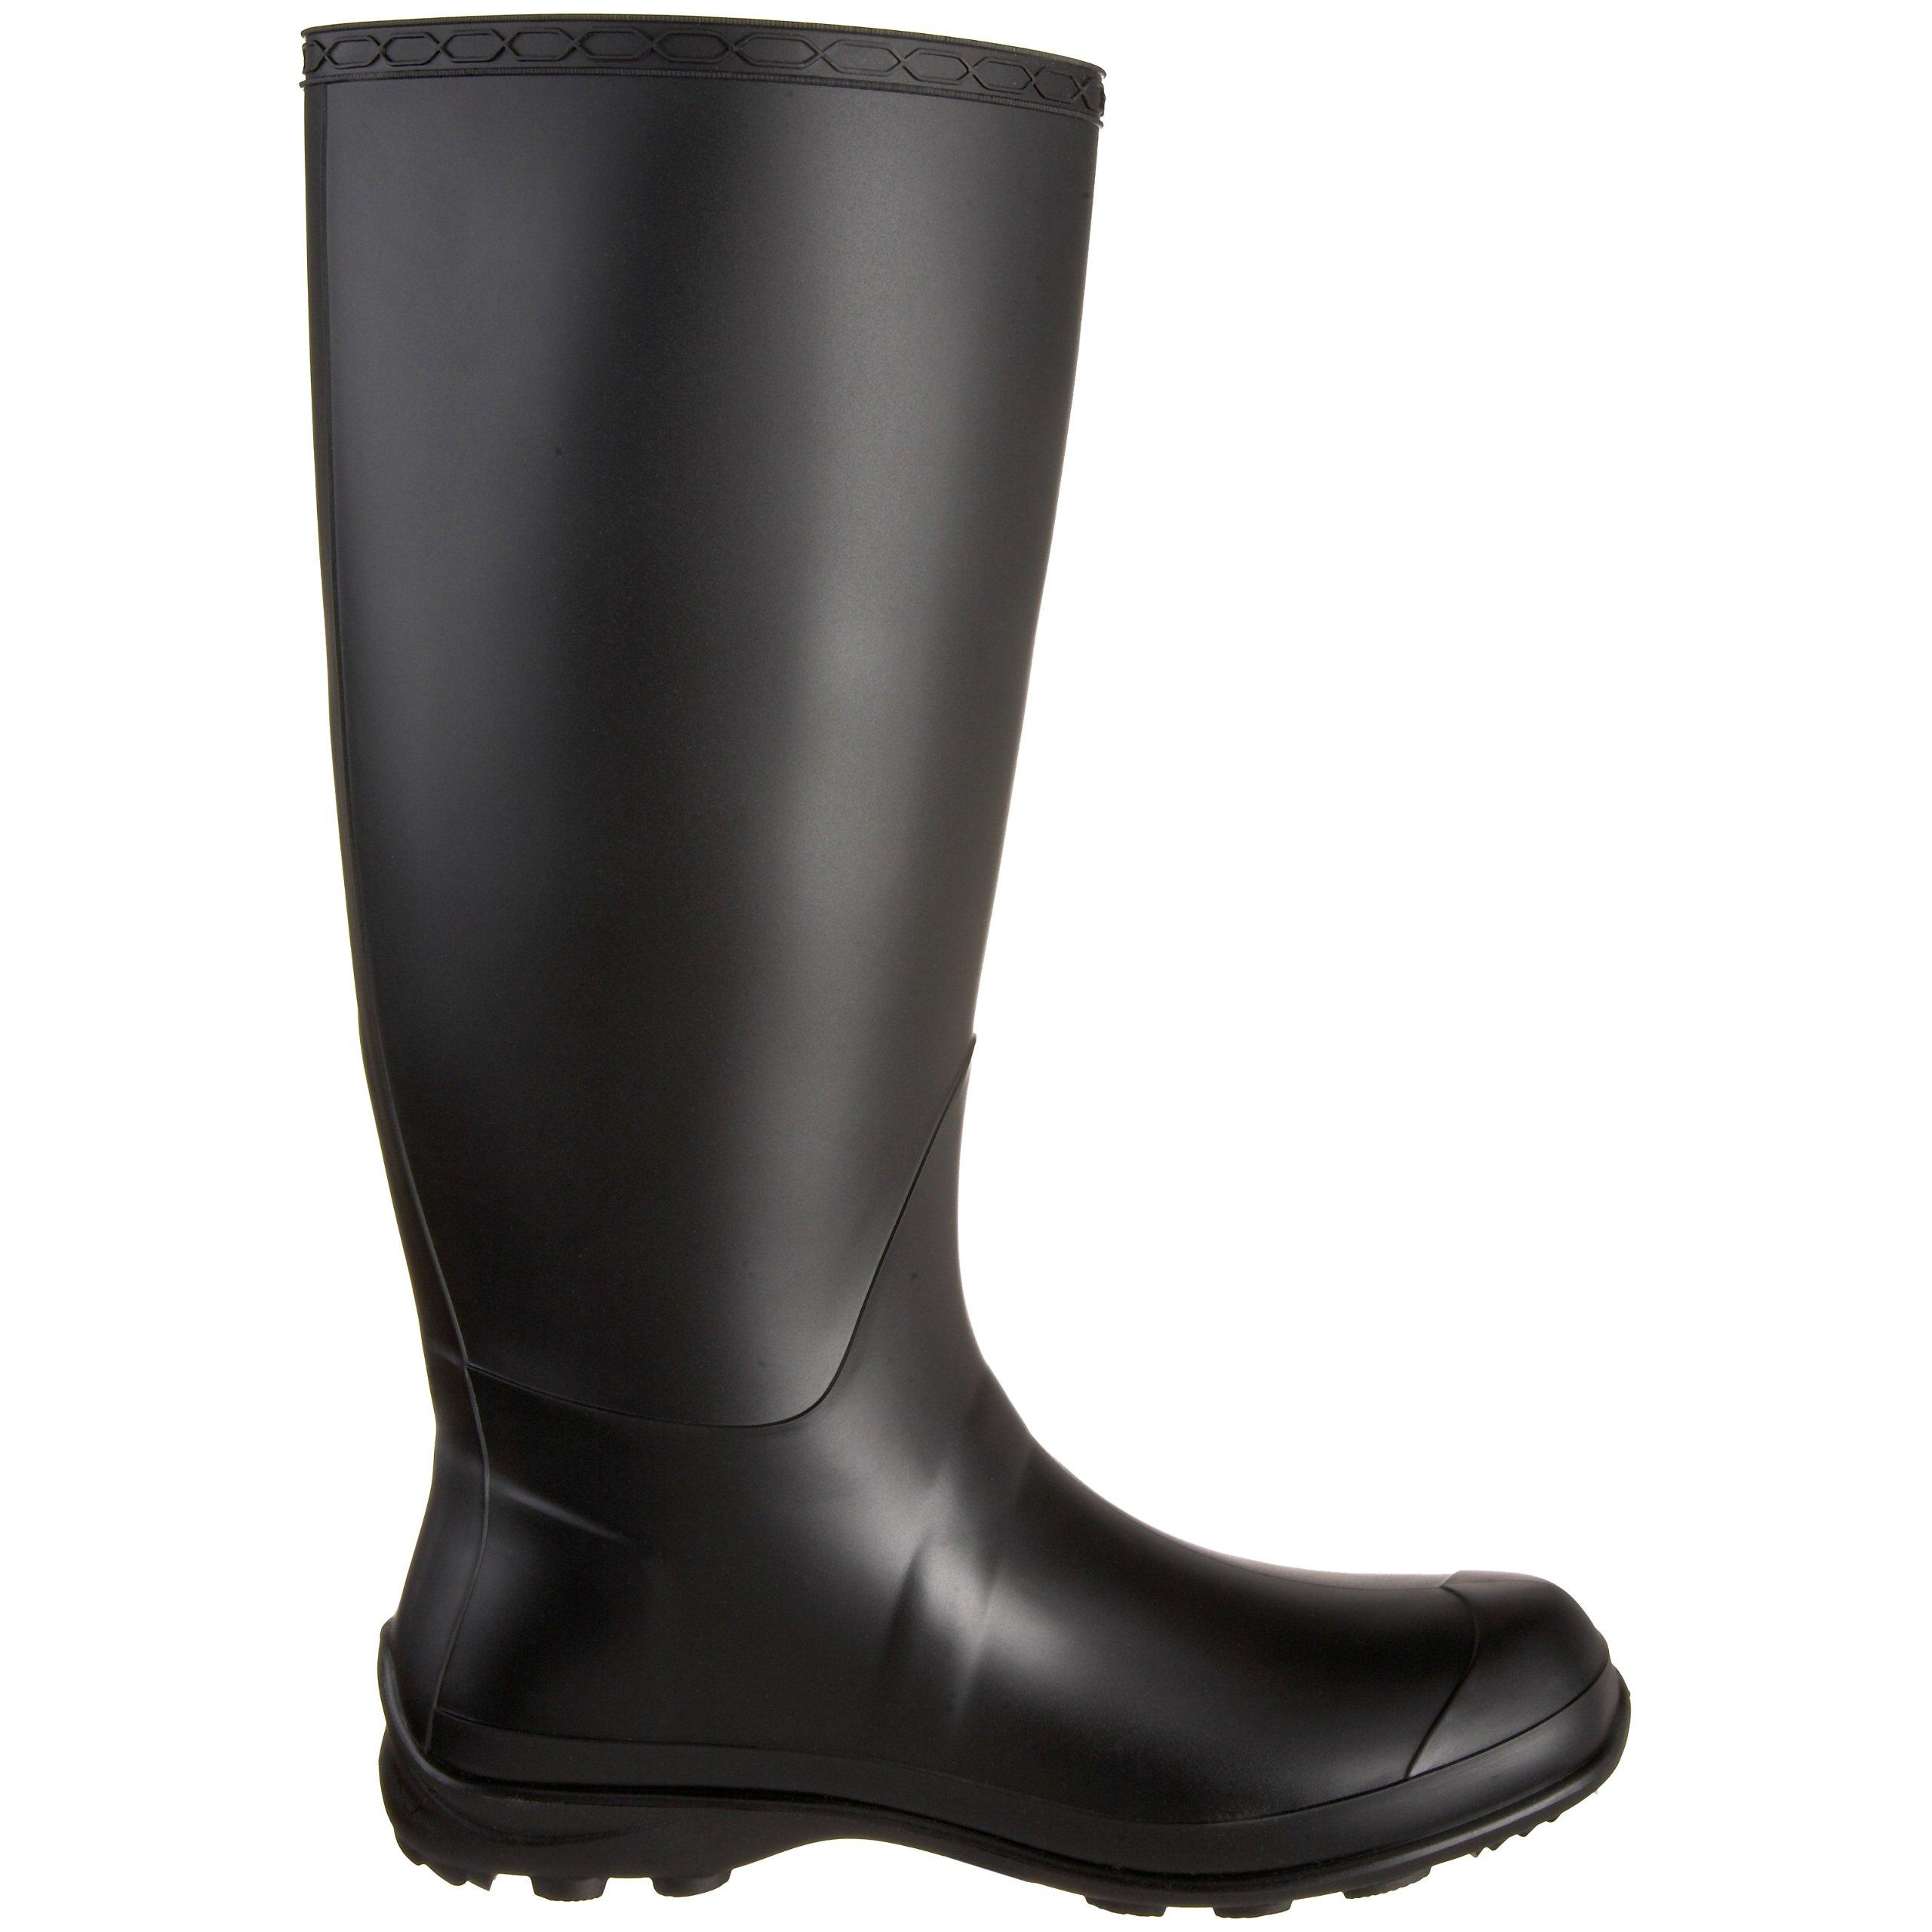 Kamik Women's Olivia Rain Boot,Black,9 M US by Kamik (Image #6)